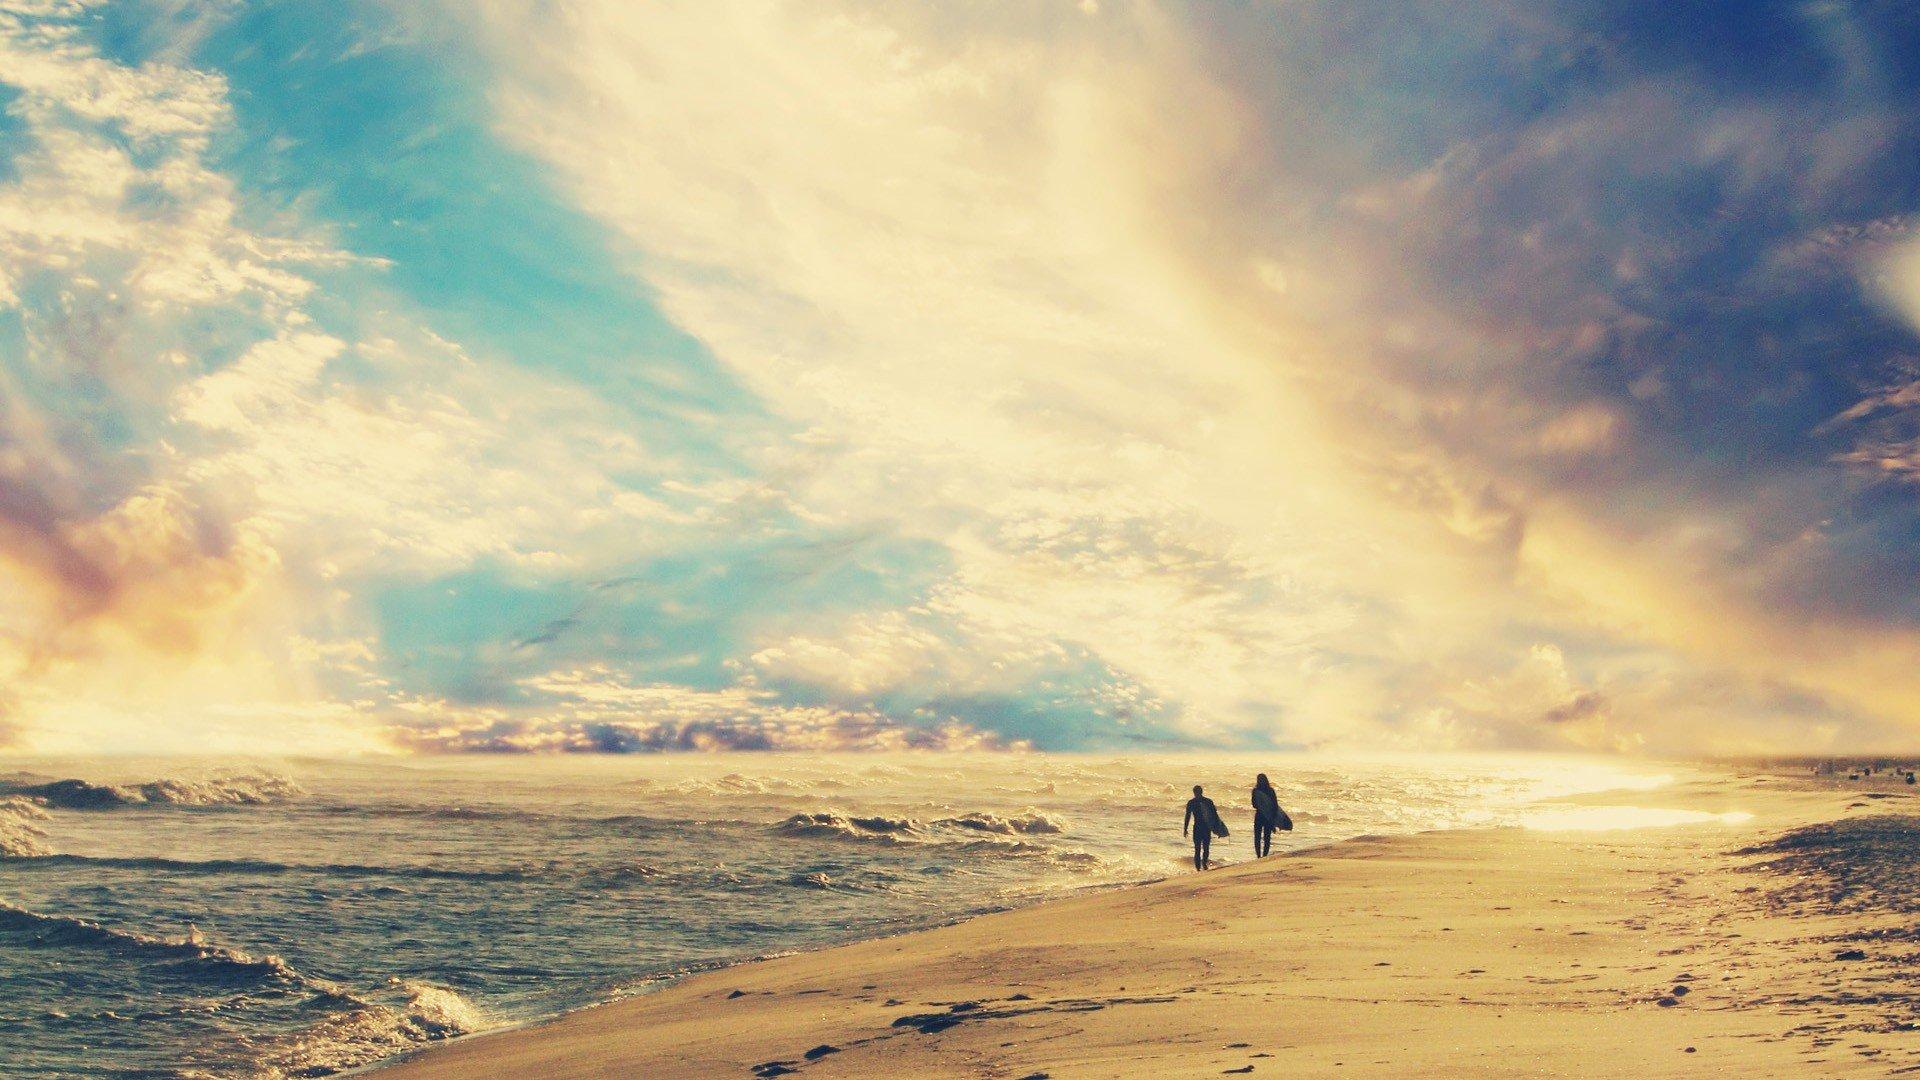 Sunset romantic dreamy beaches wallpaper | 1920x1080 ...